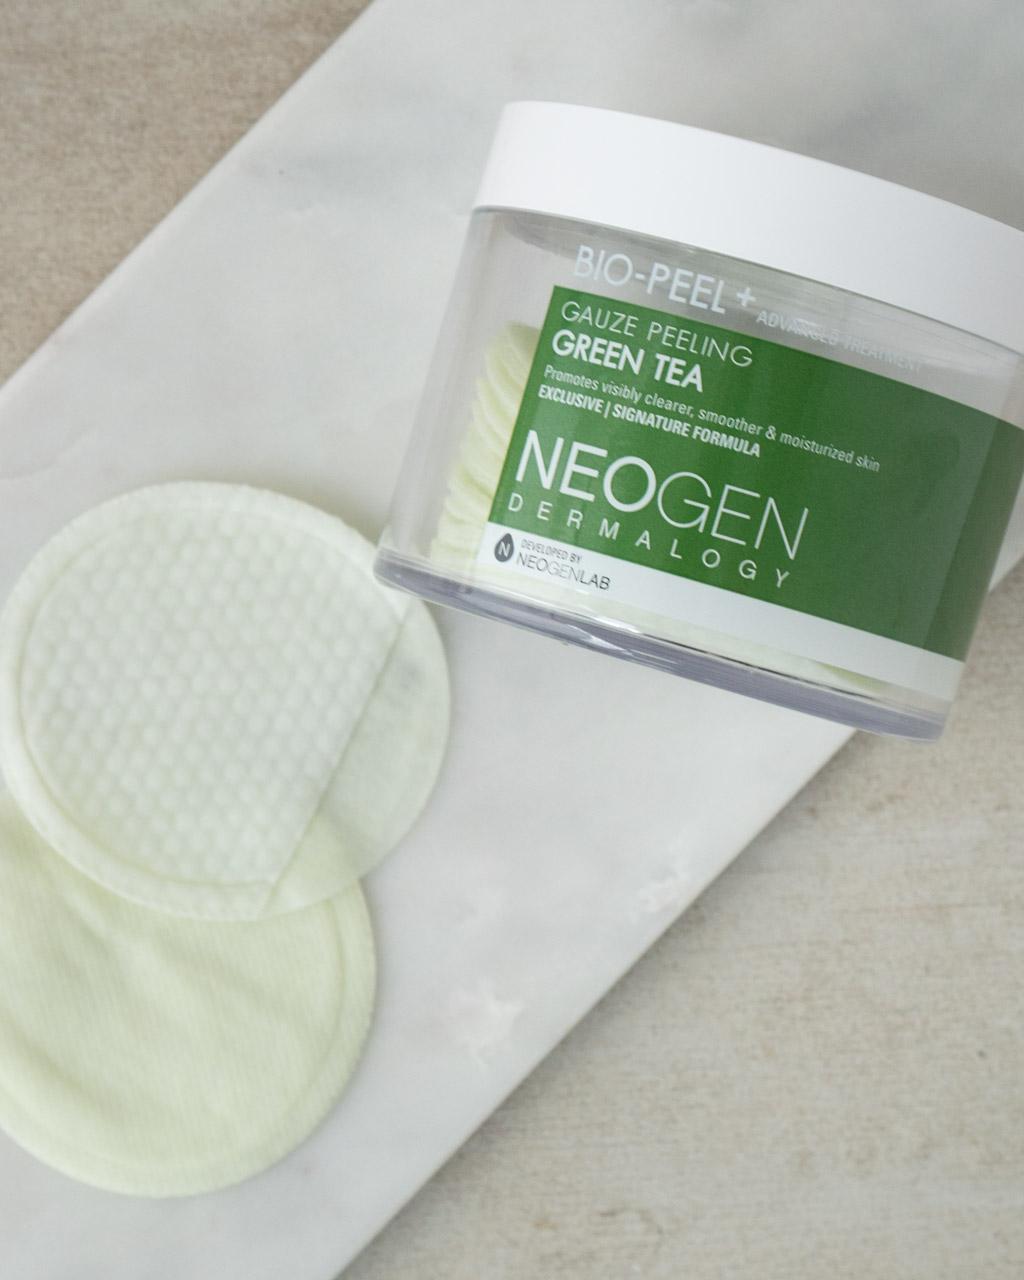 NEOGEN-Bio-Peel-Gauze-Peeling-Green-Tea